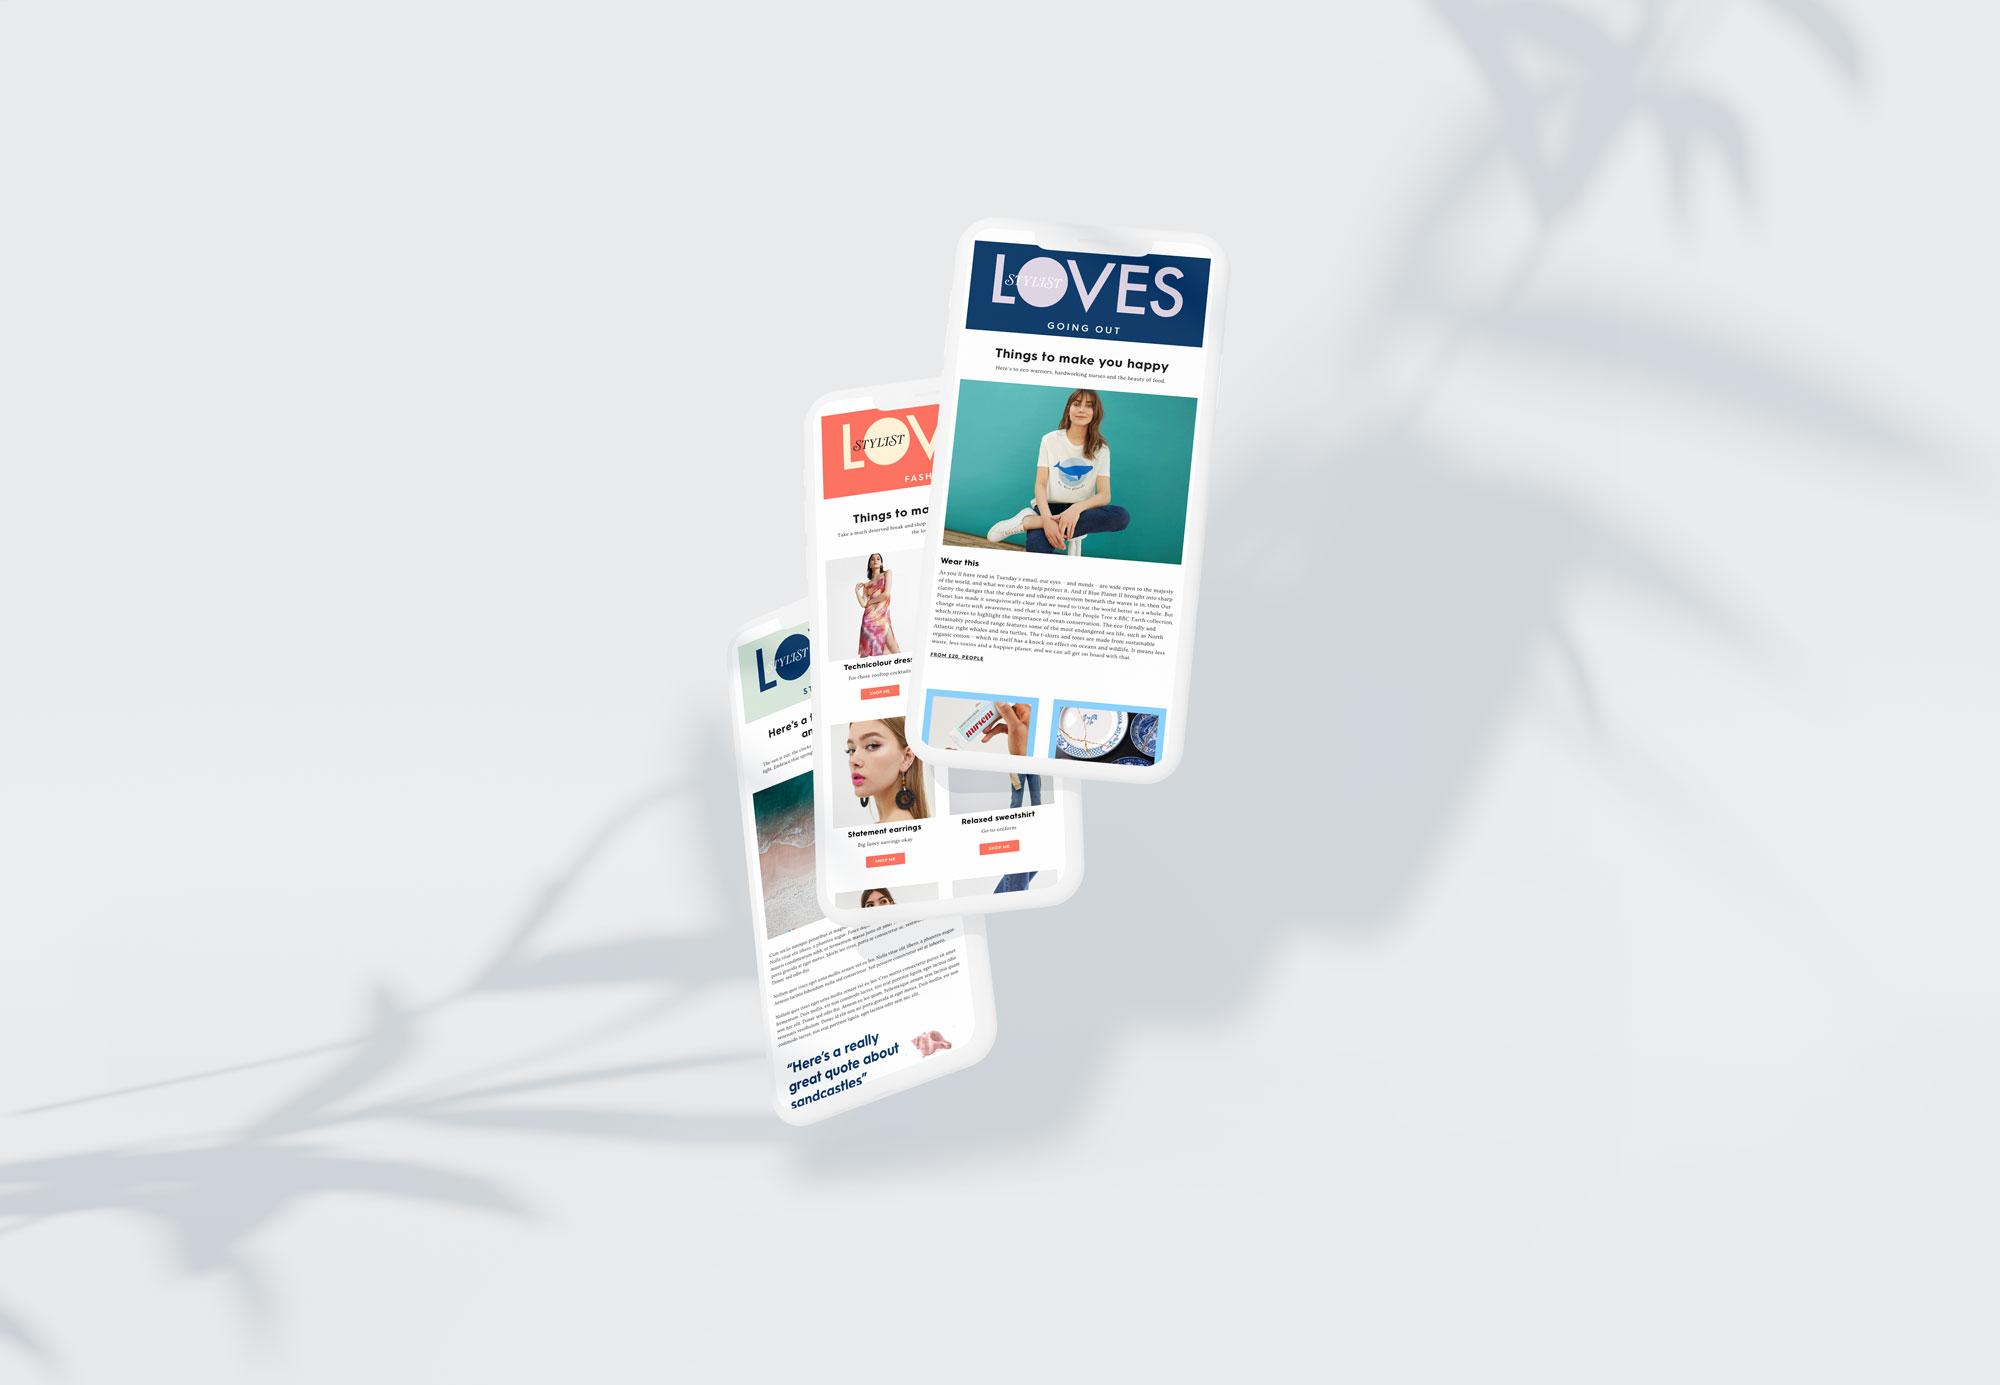 loves-mobile-mockup-iphones